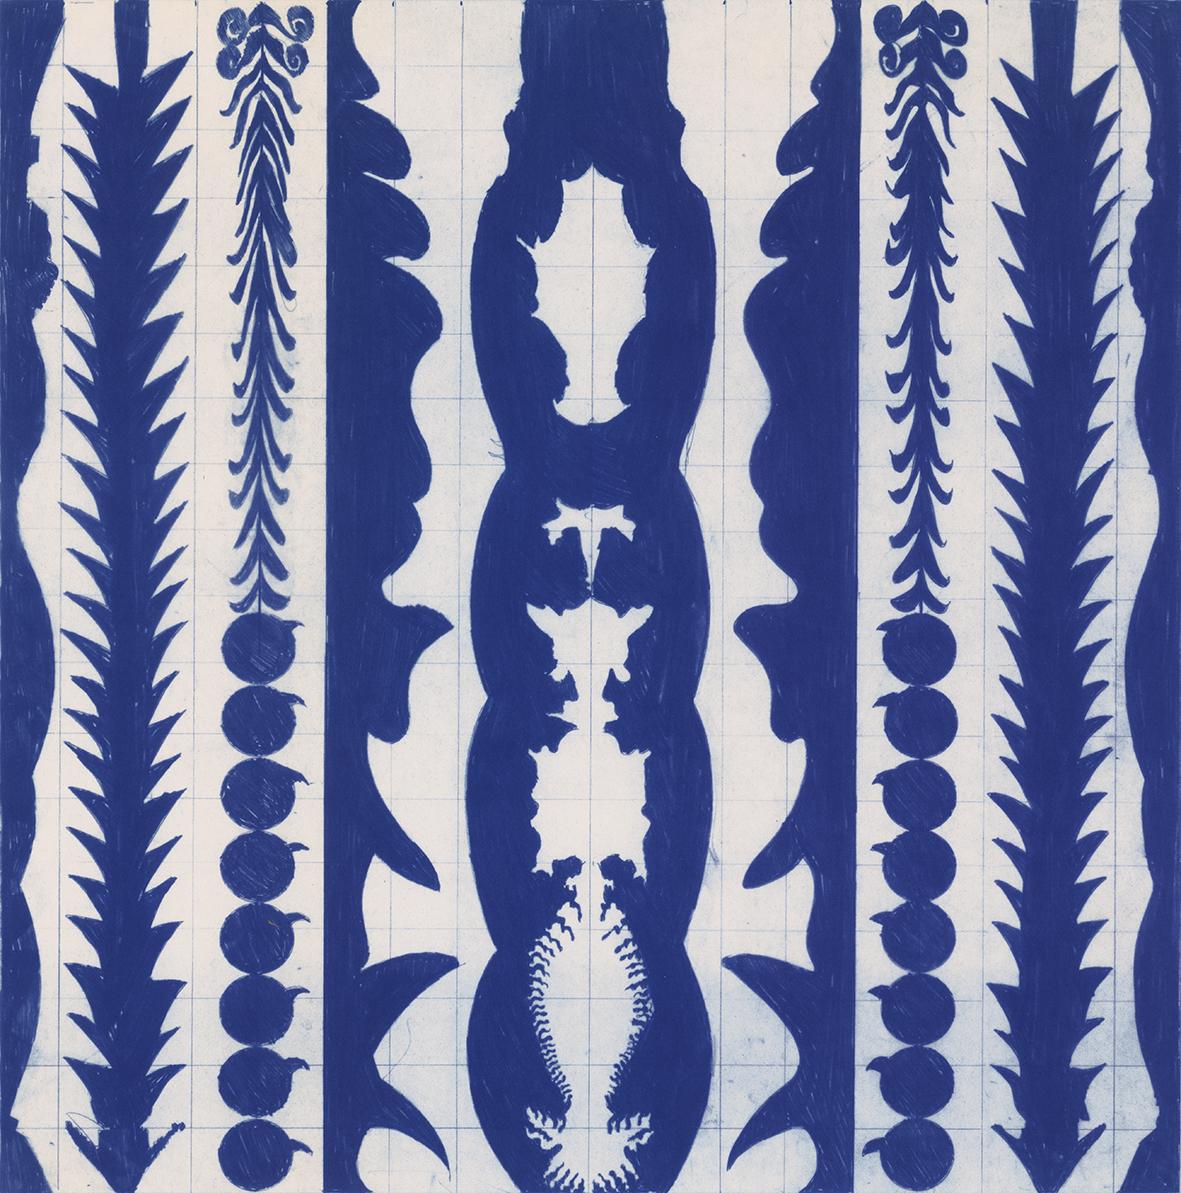 FIGURAS VERTICALES CON FRUTA (VERTICAL FIGURES WITH FRUIT), 1991